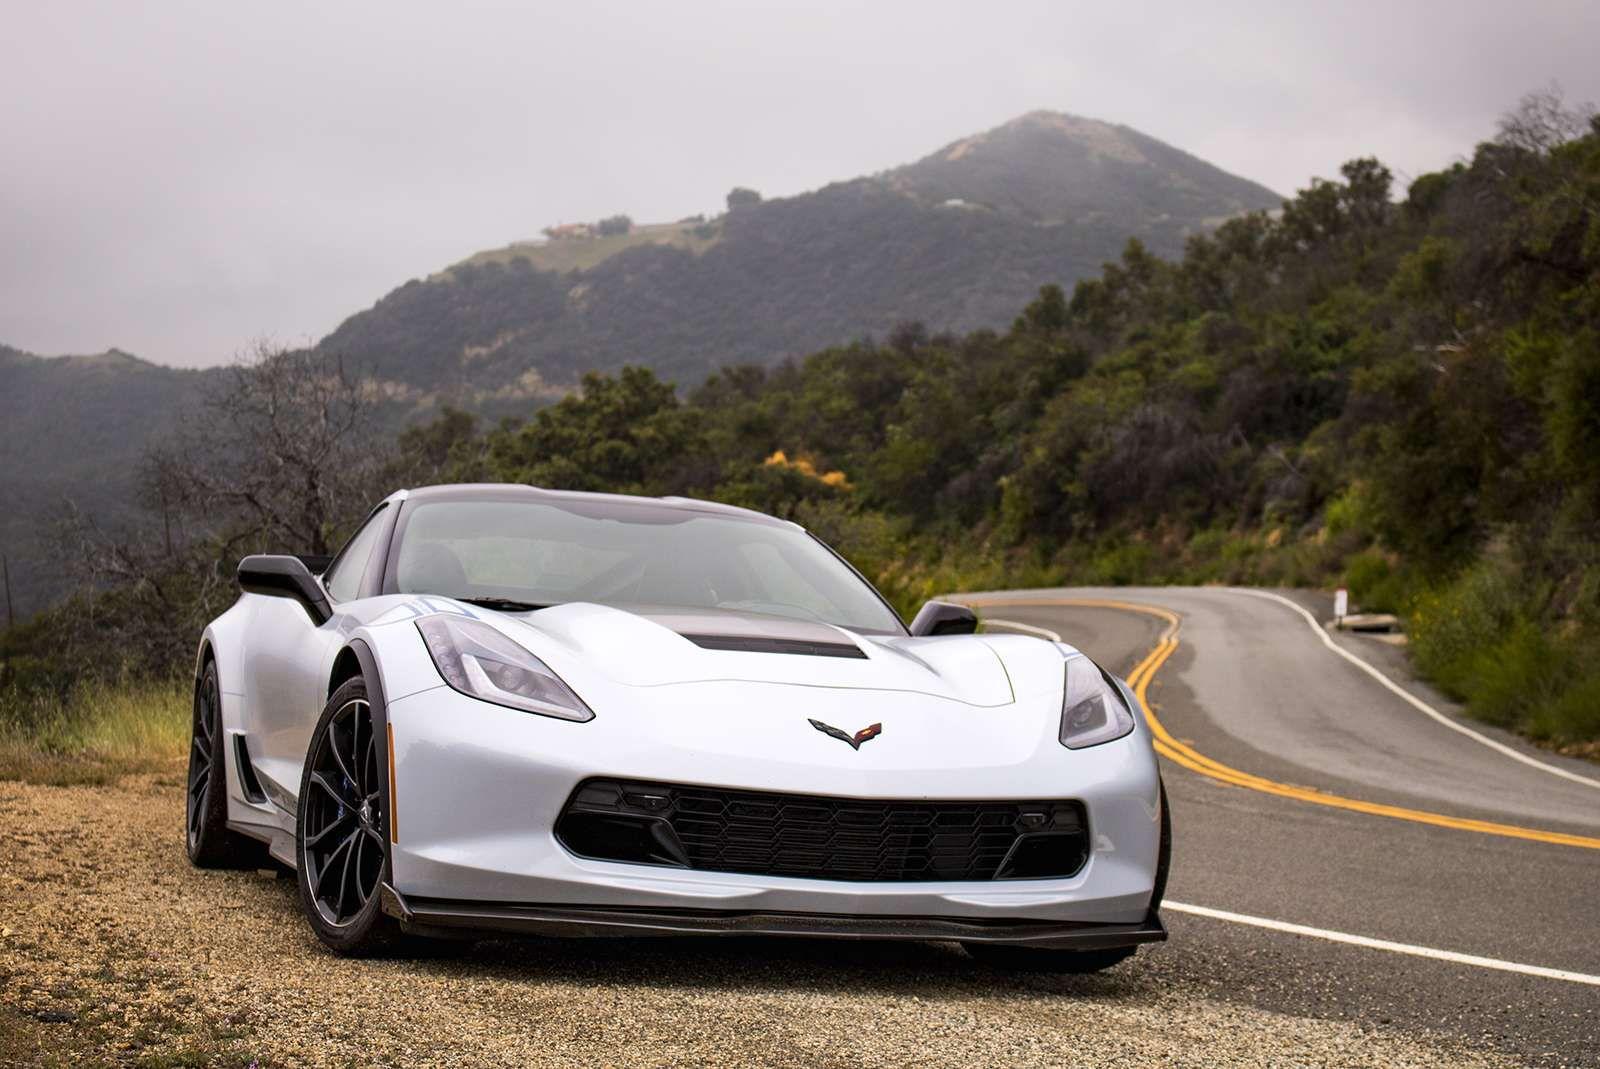 2018 Chevrolet Corvette Grand Sport Carbon 65 Review Into